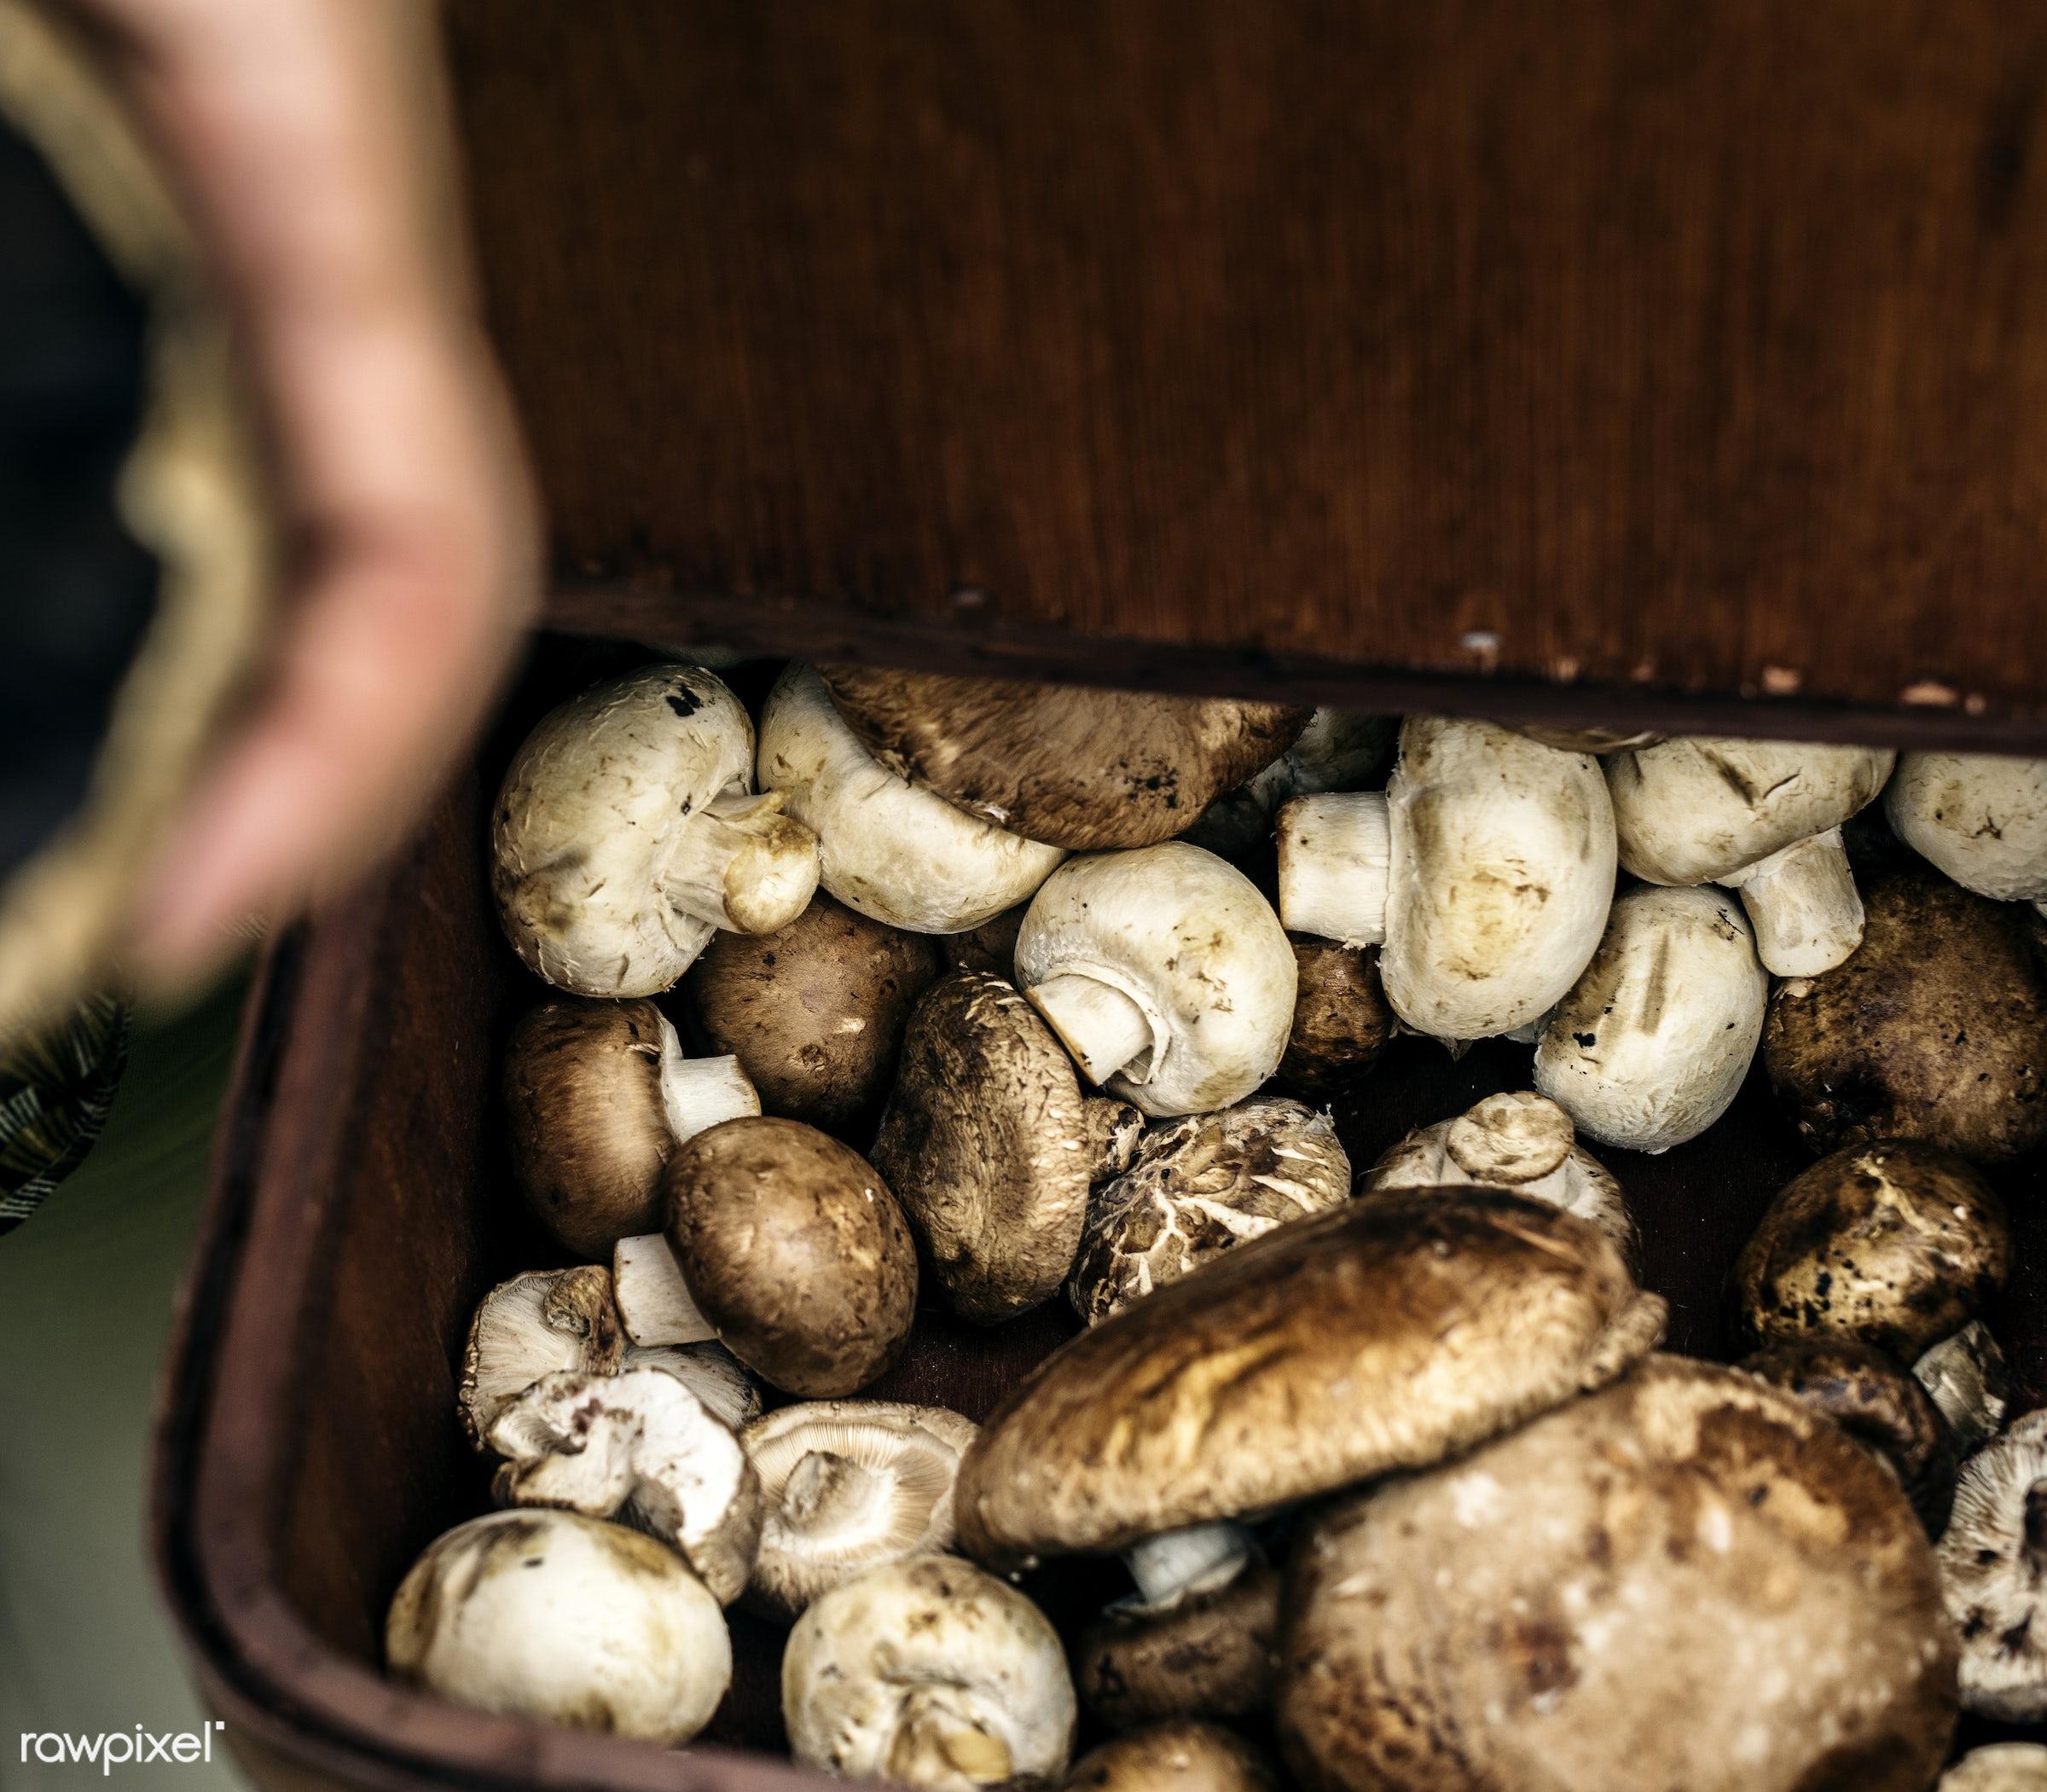 mushroom, holding, real, fresh, showing, wooden basket, closeup, healthcare, white button mushroom, nutrients, organic,...